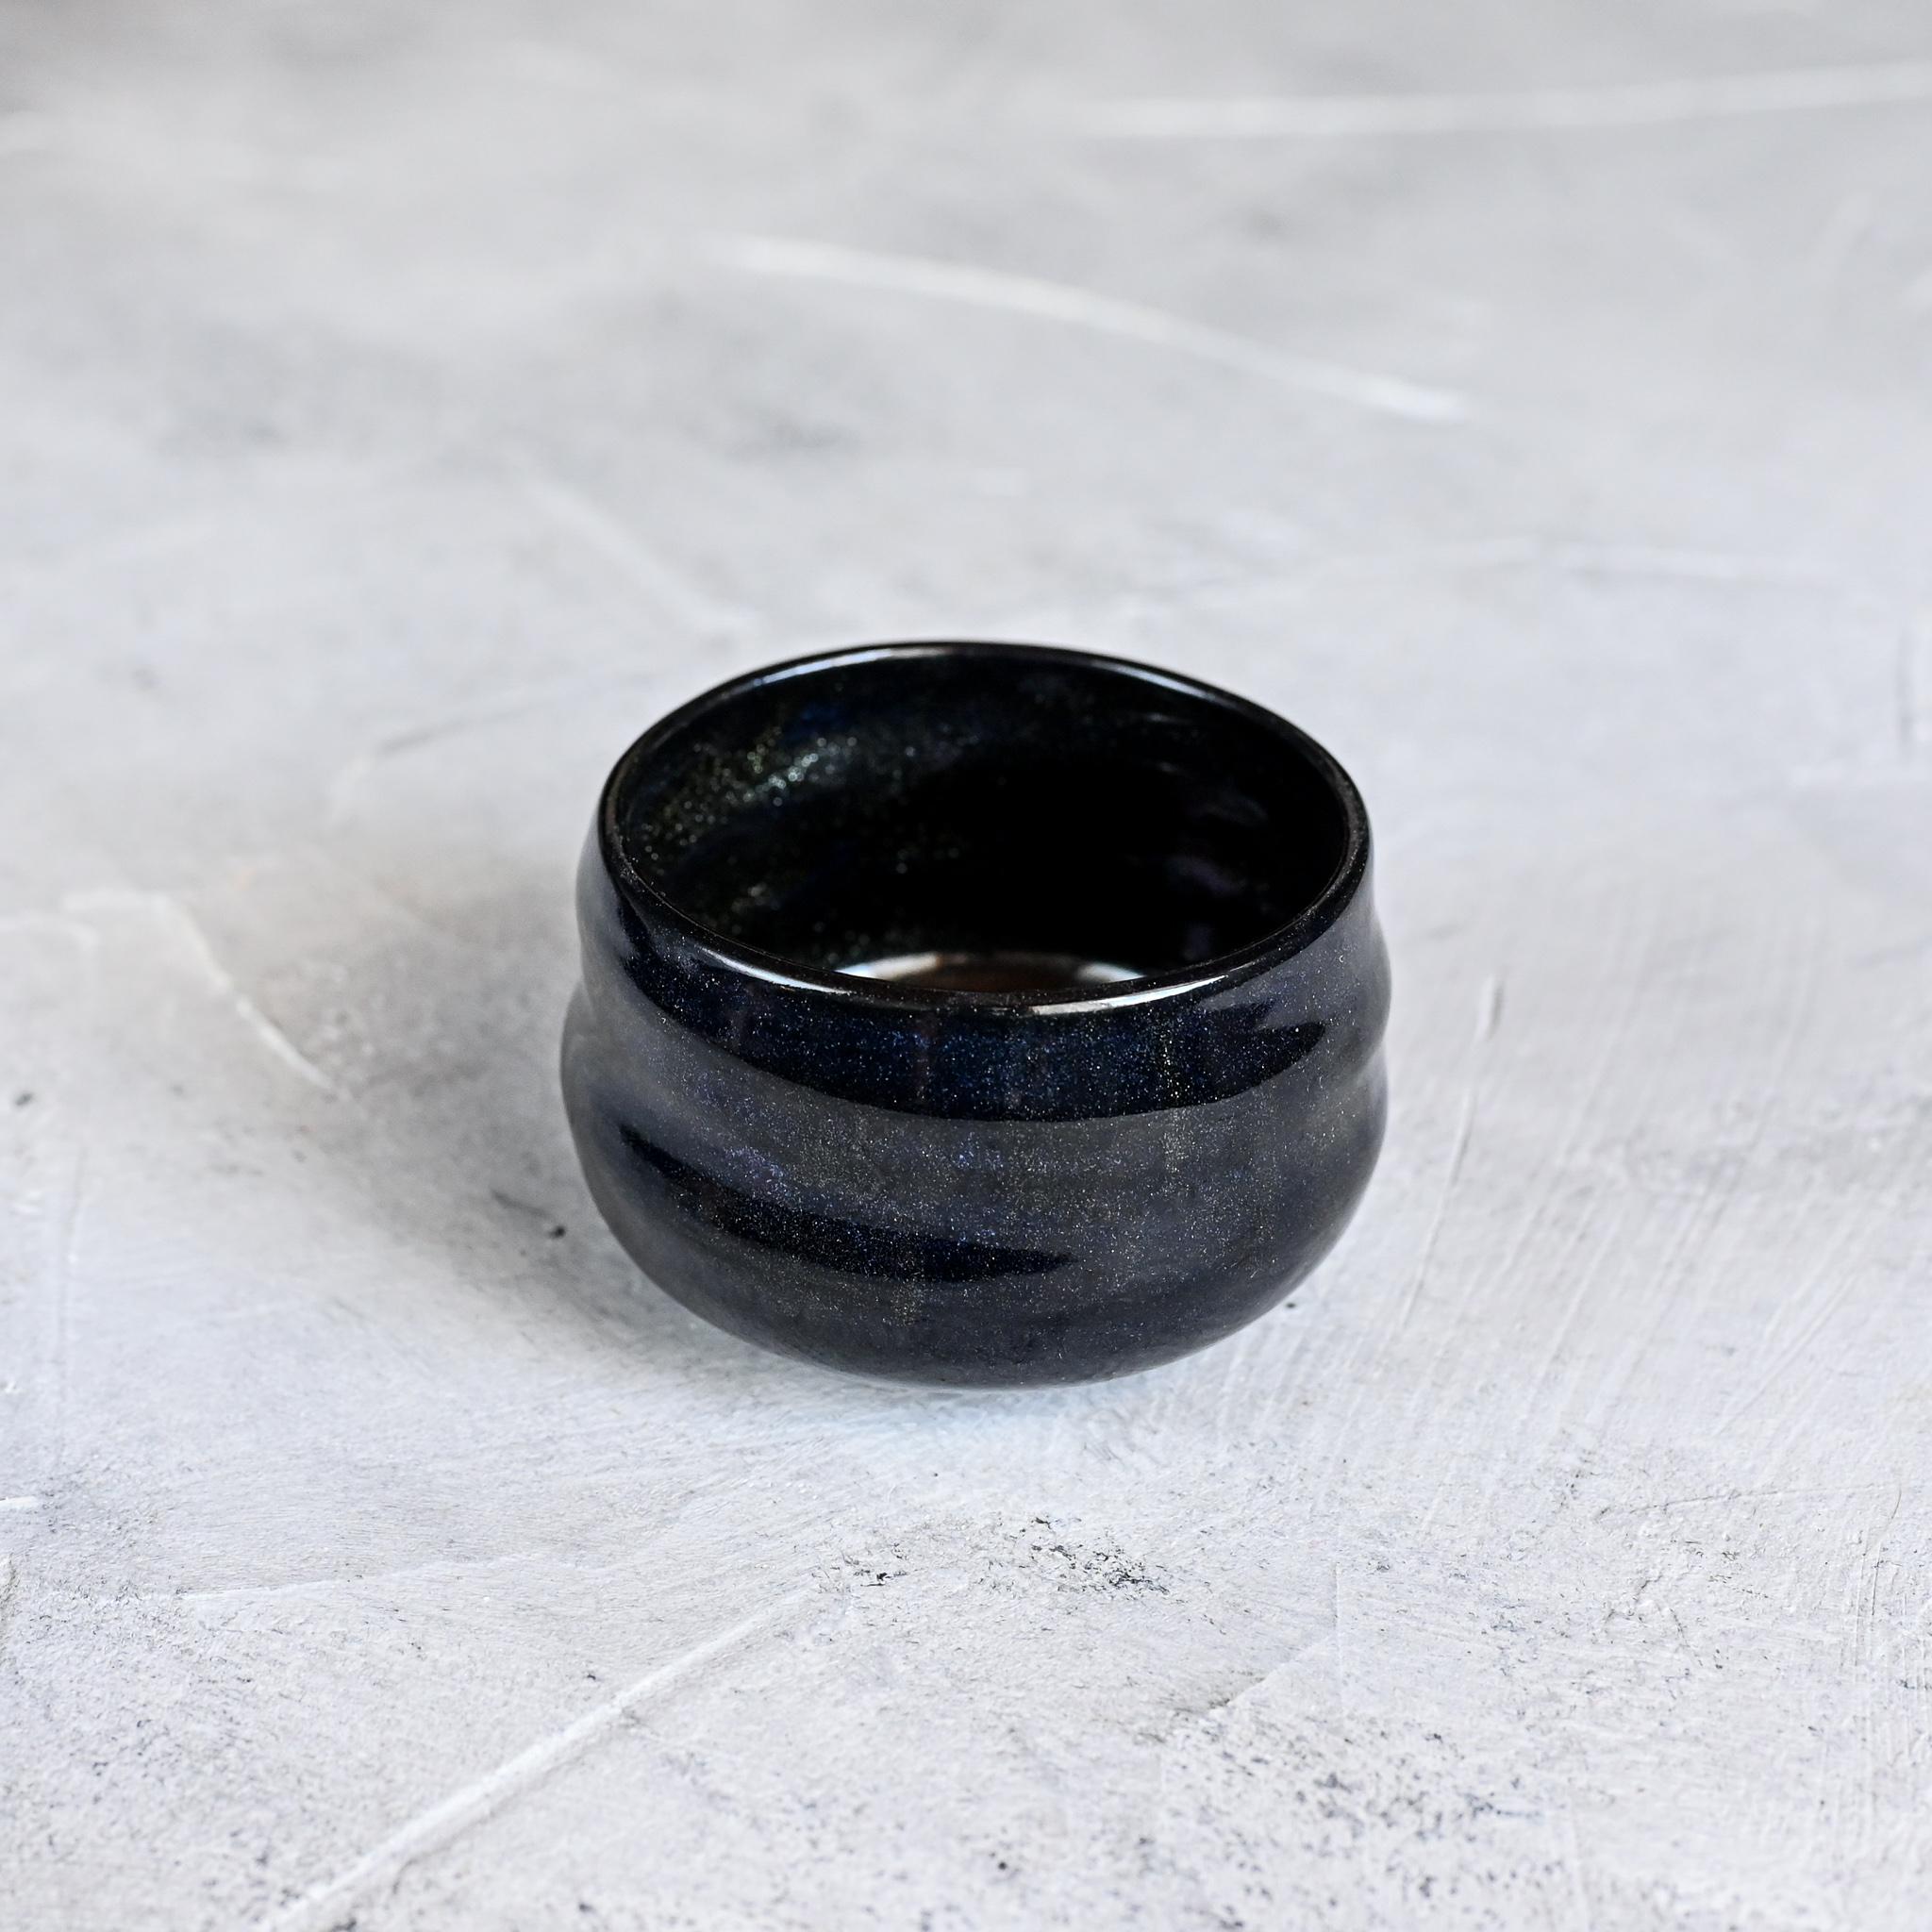 картинка Керамический стакан юноми Марии Левиной малый 2 - DishWishes.Ru